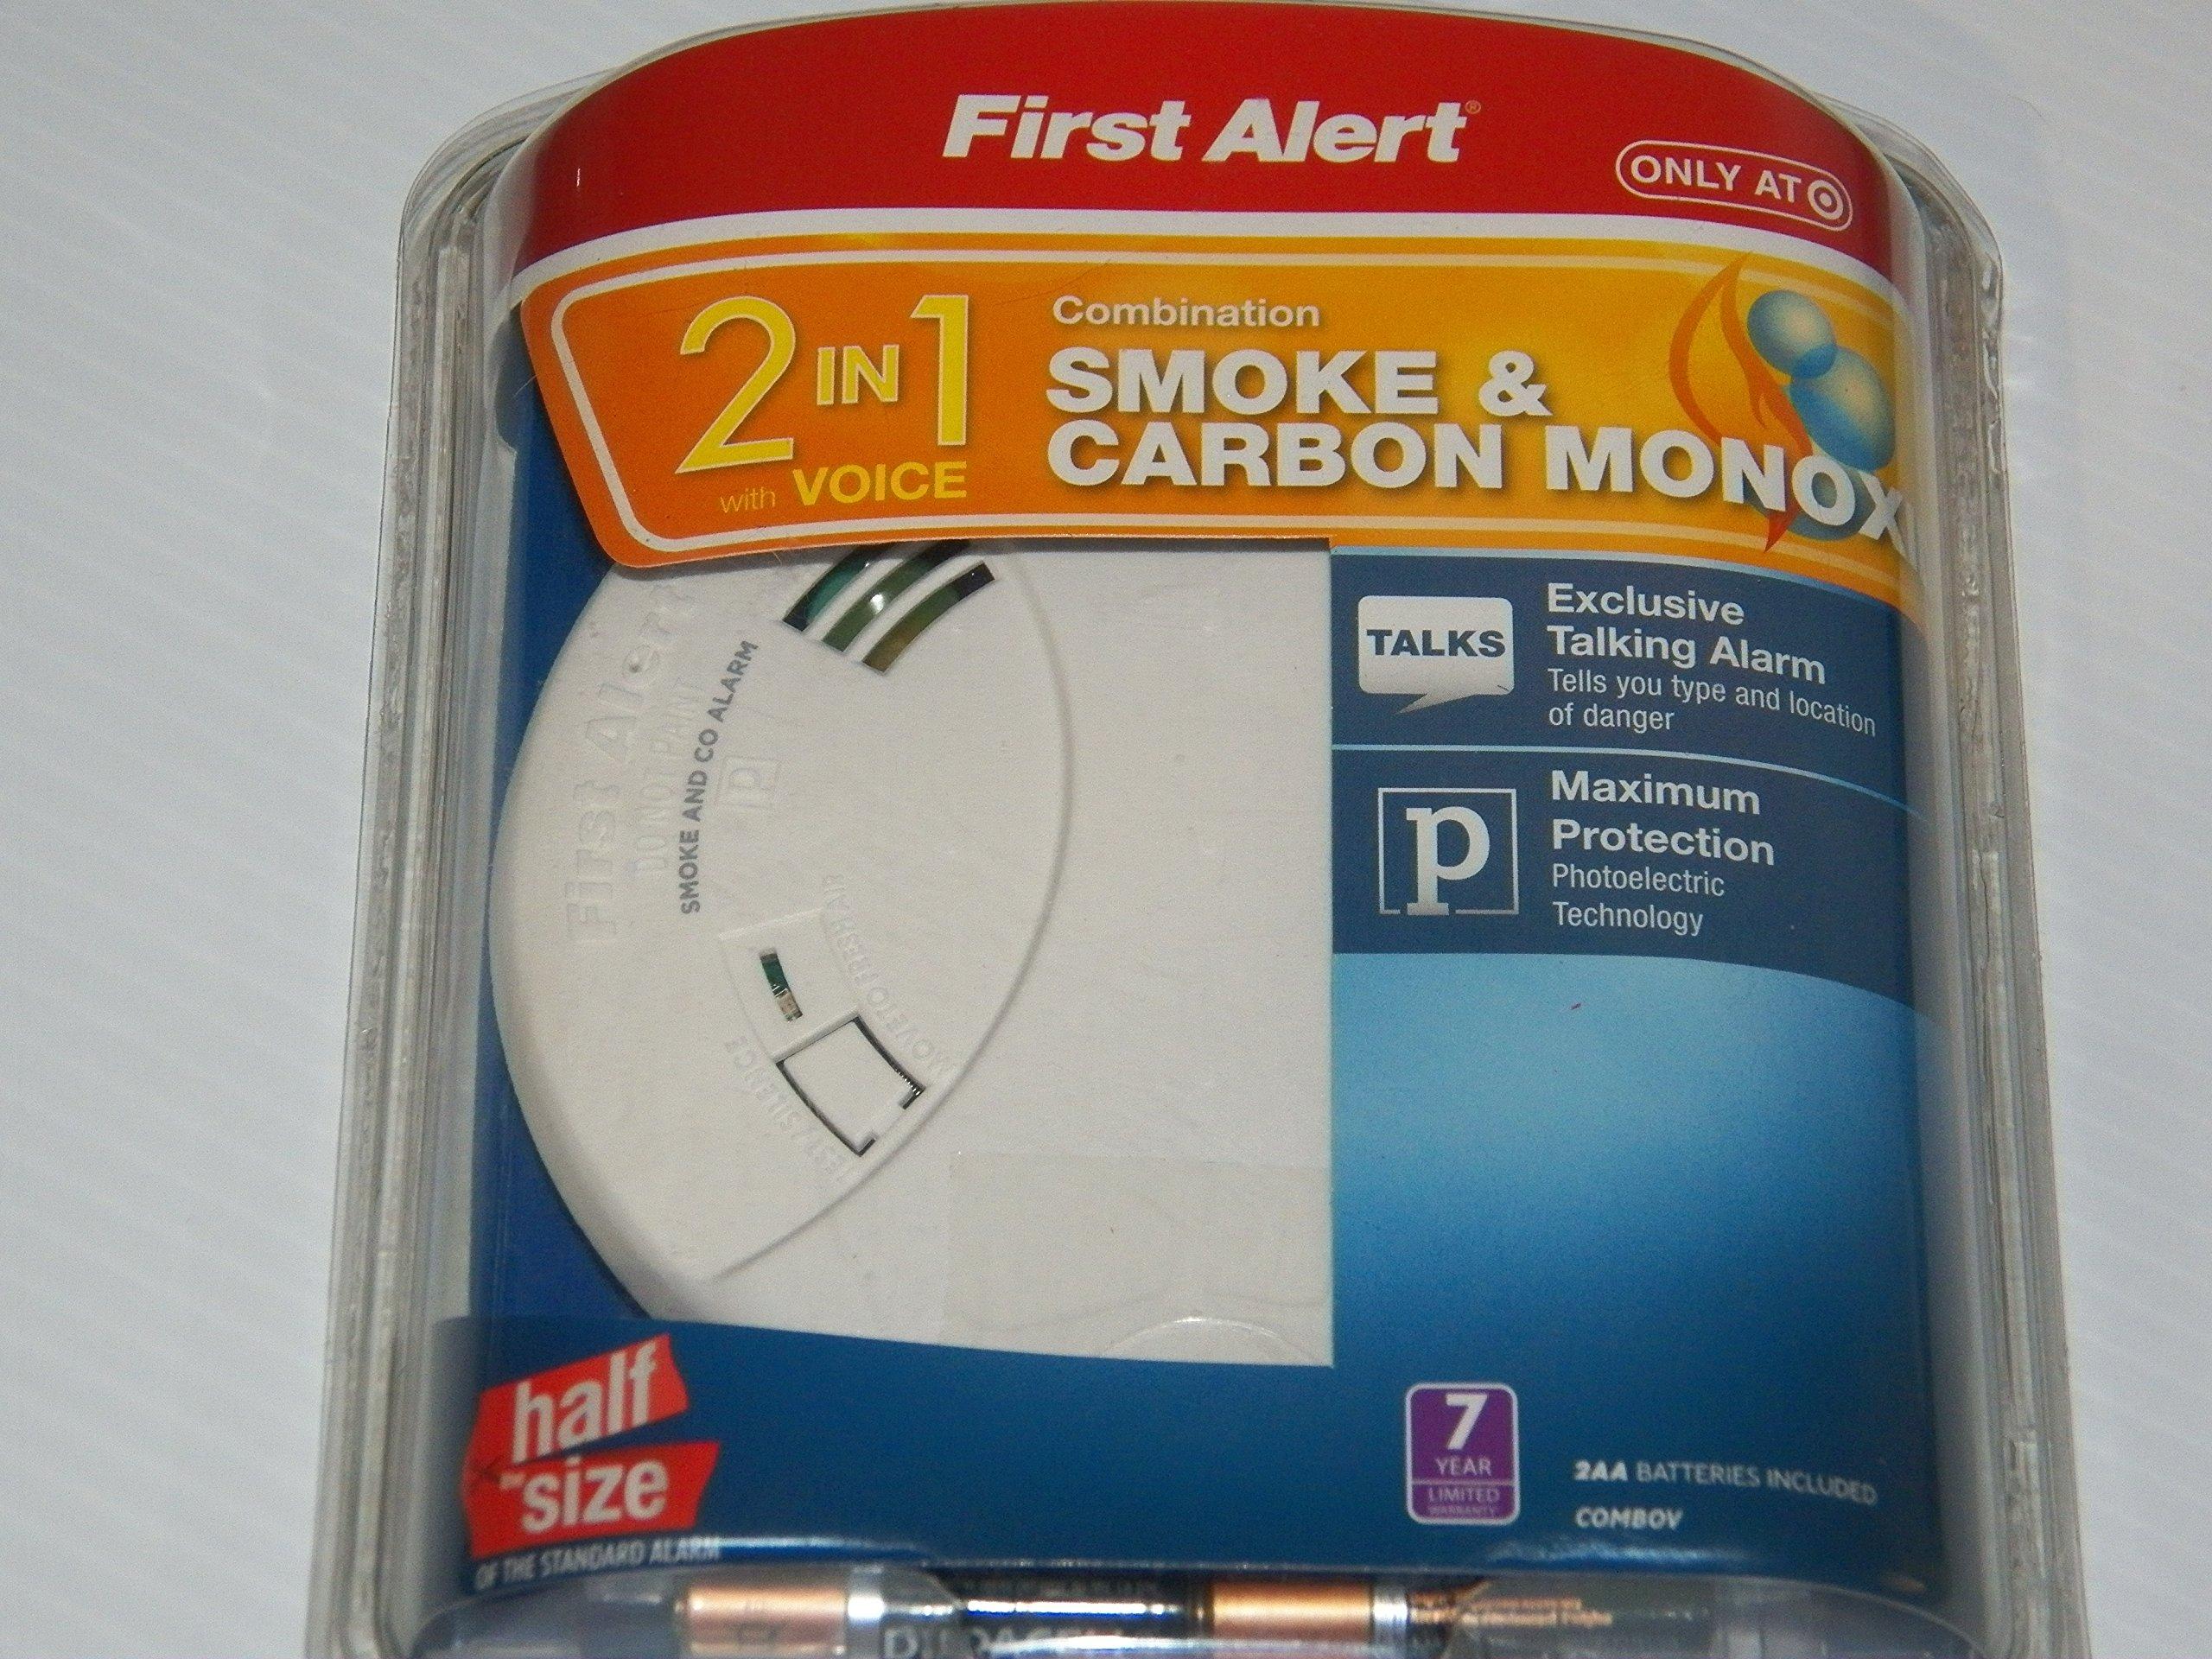 First Alert COMBOV Combination DC Smoke & Carbon Monoxide Alarm with Voice Alert